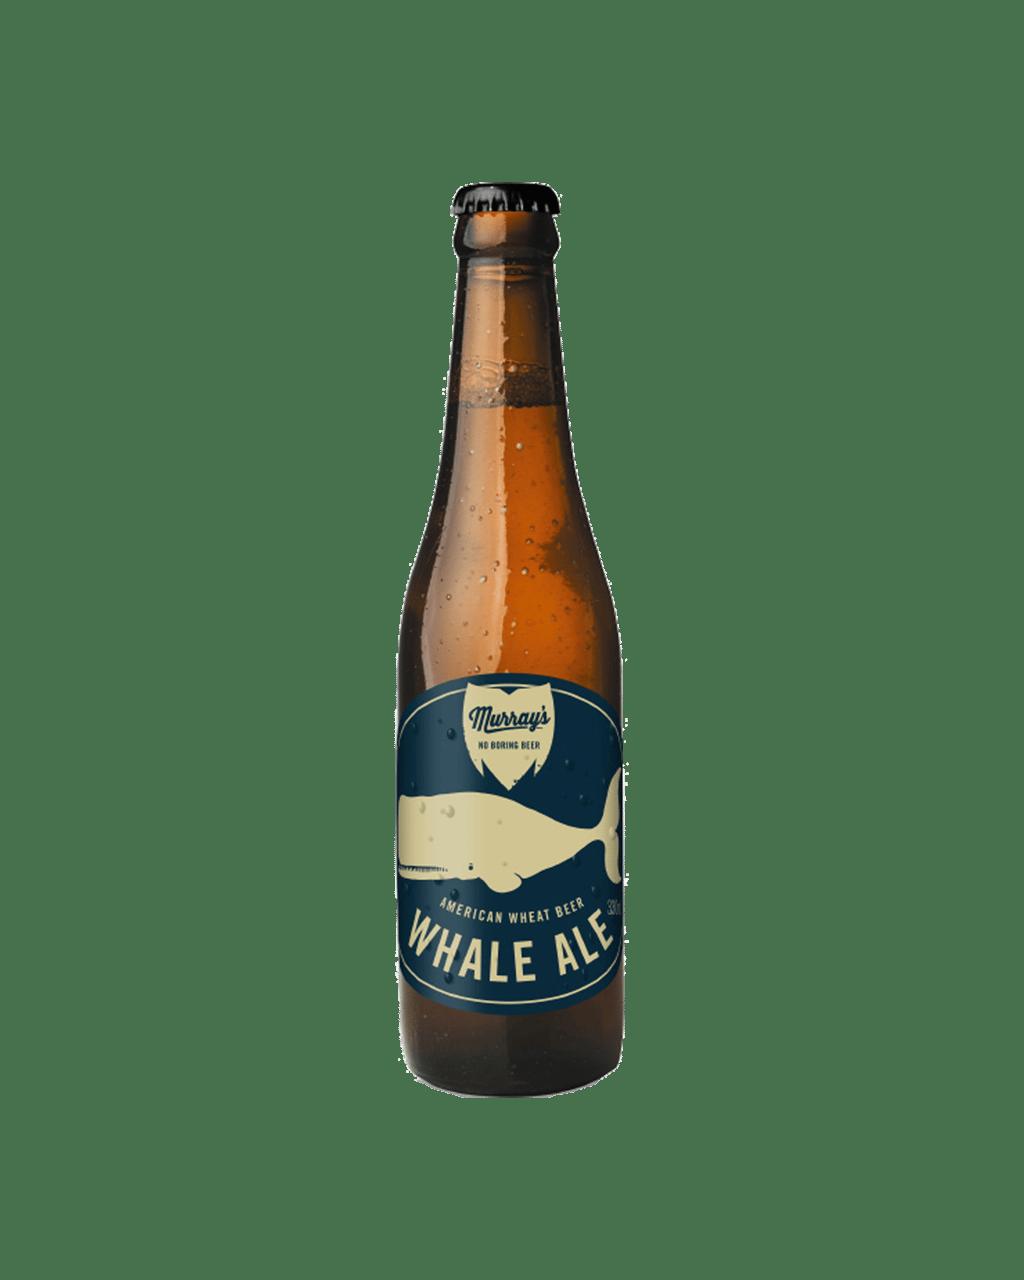 murray s whale ale 330ml dan murphy s buy wine champagne beer